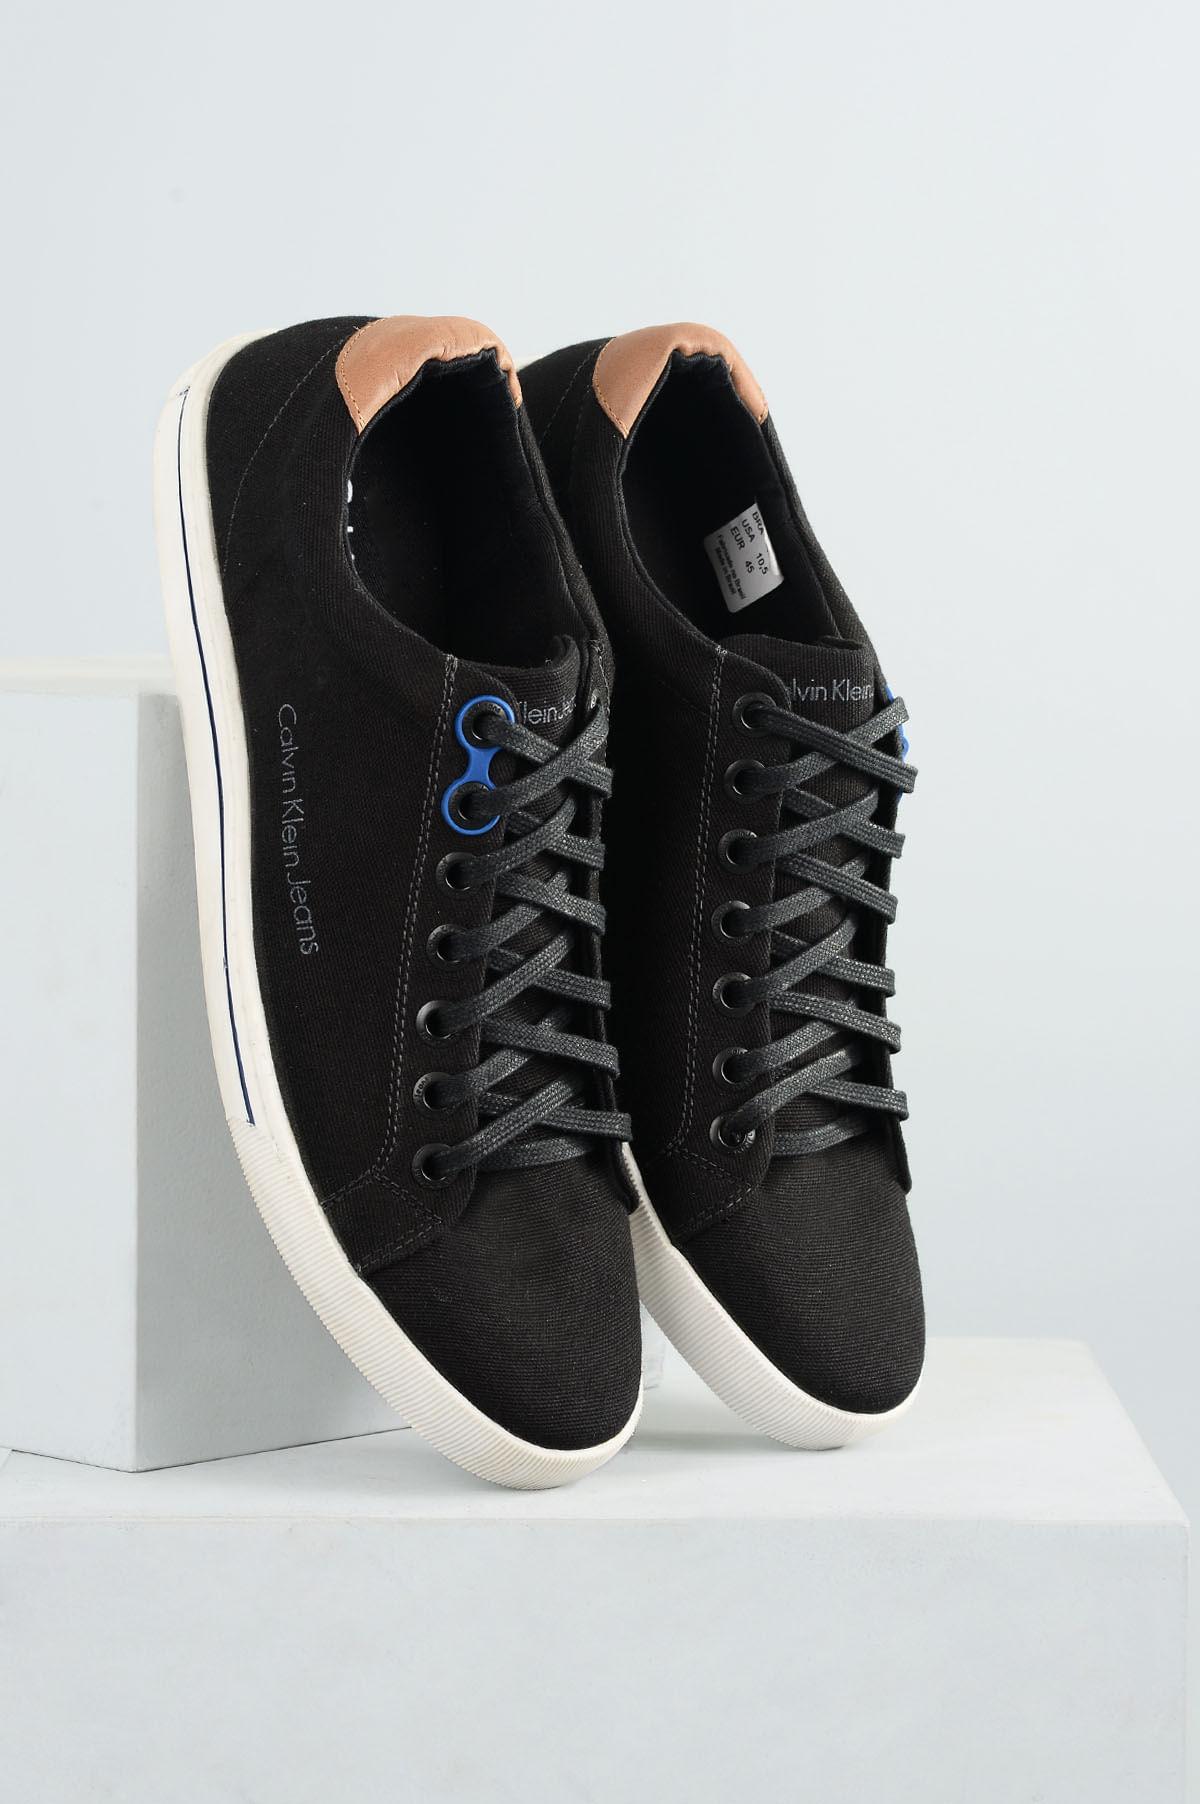 4483c5e5e1d Sapatênis Masculino Calvin Klein Enzo TEC - PRETO - Mundial Calçados